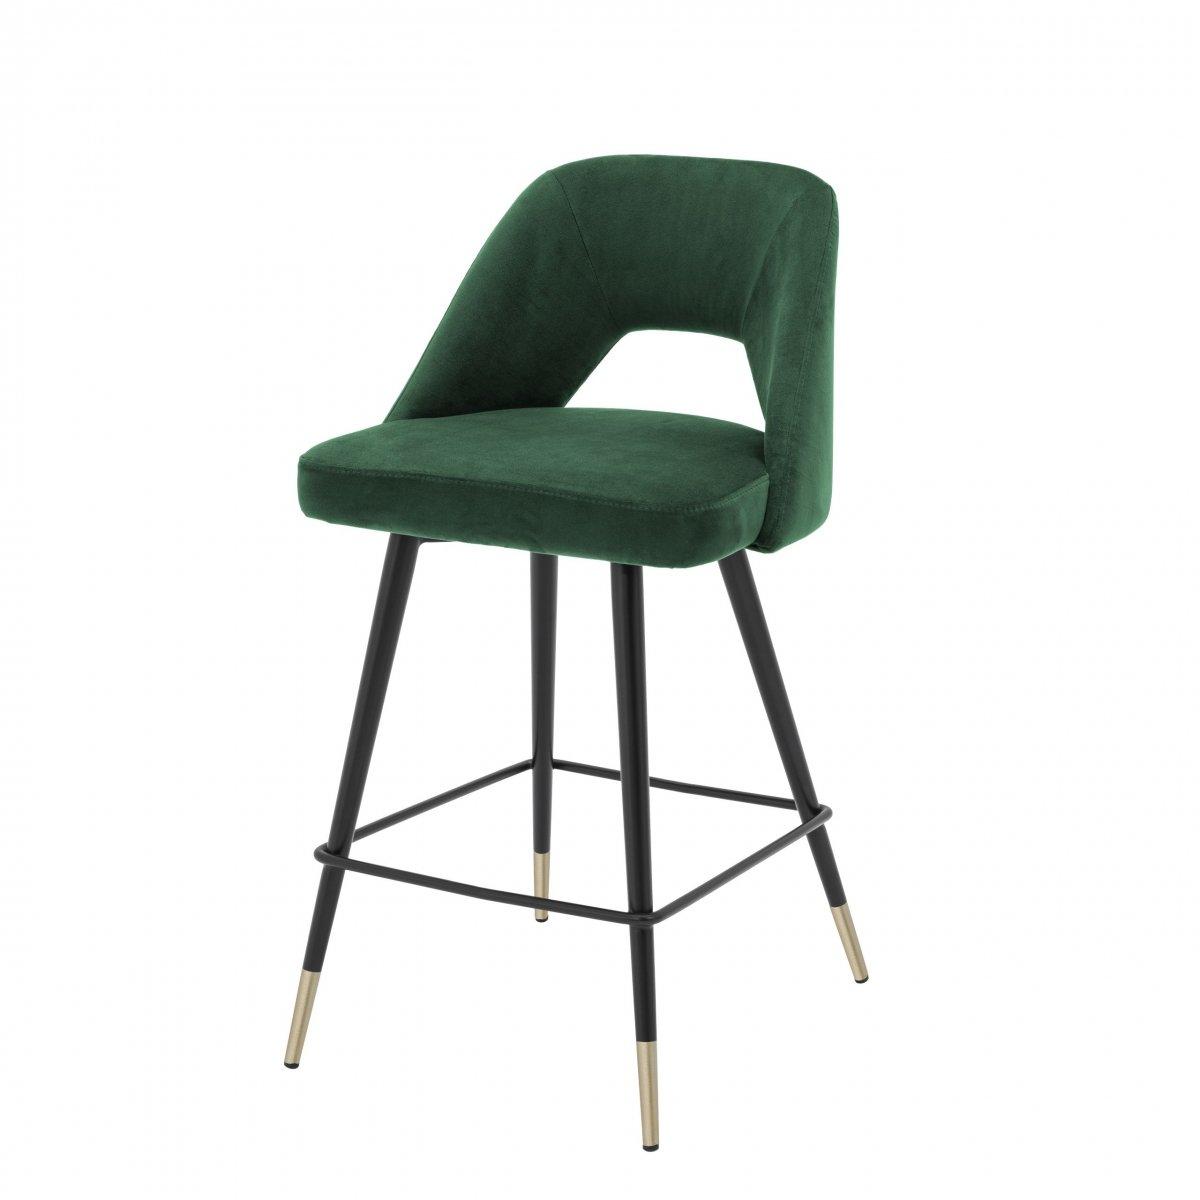 Полубарный стул Eichholtz Counter Bar Stool Avorio Green  - фото 1